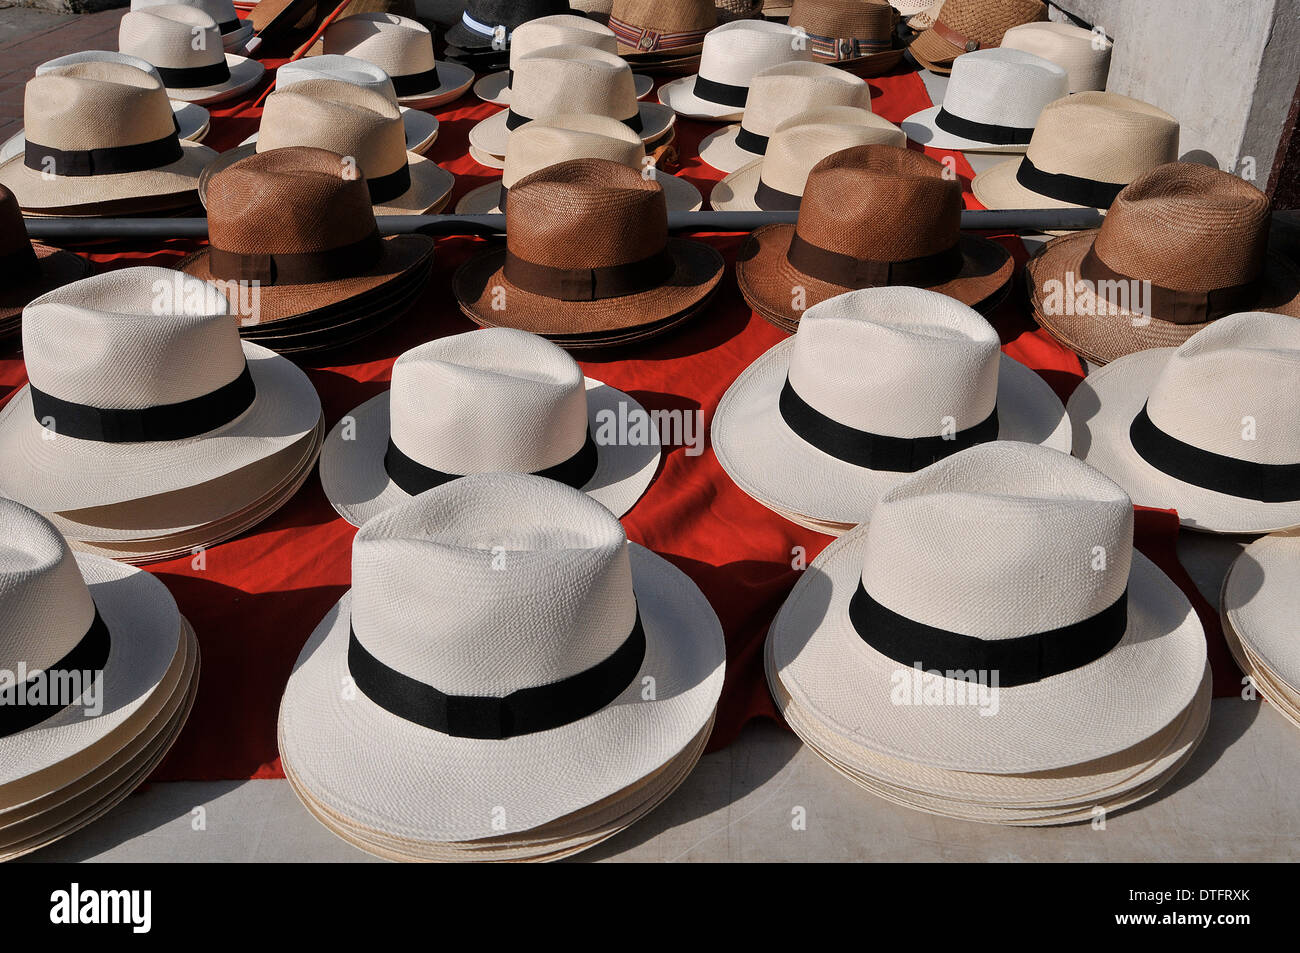 432254276 Panama Hats Panama City Panama Stock Photos & Panama Hats Panama ...